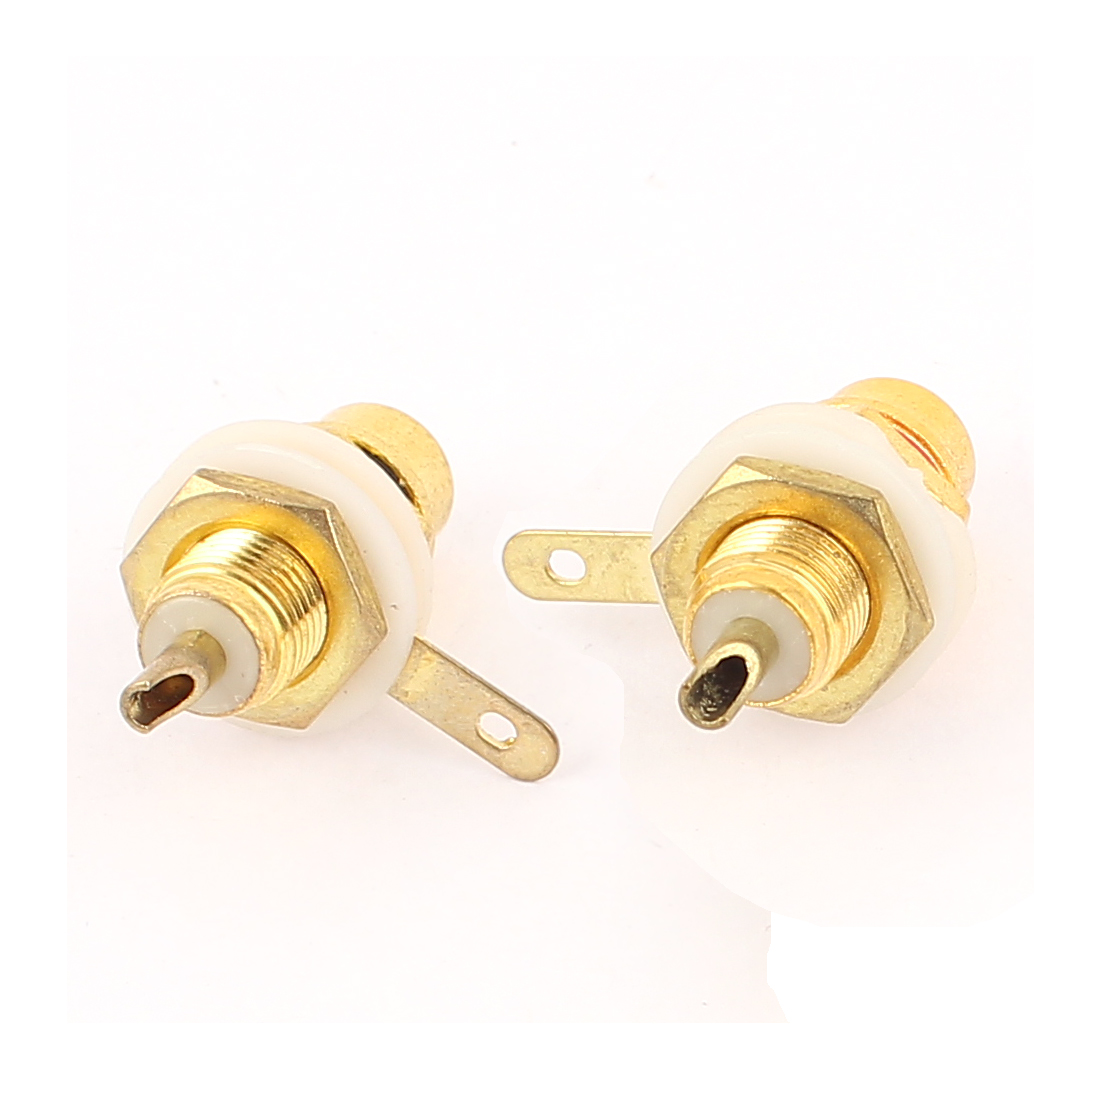 2 Pcs Good Amplifier Female Classis Panel PCB Jack Audio Terminal RCA Connector